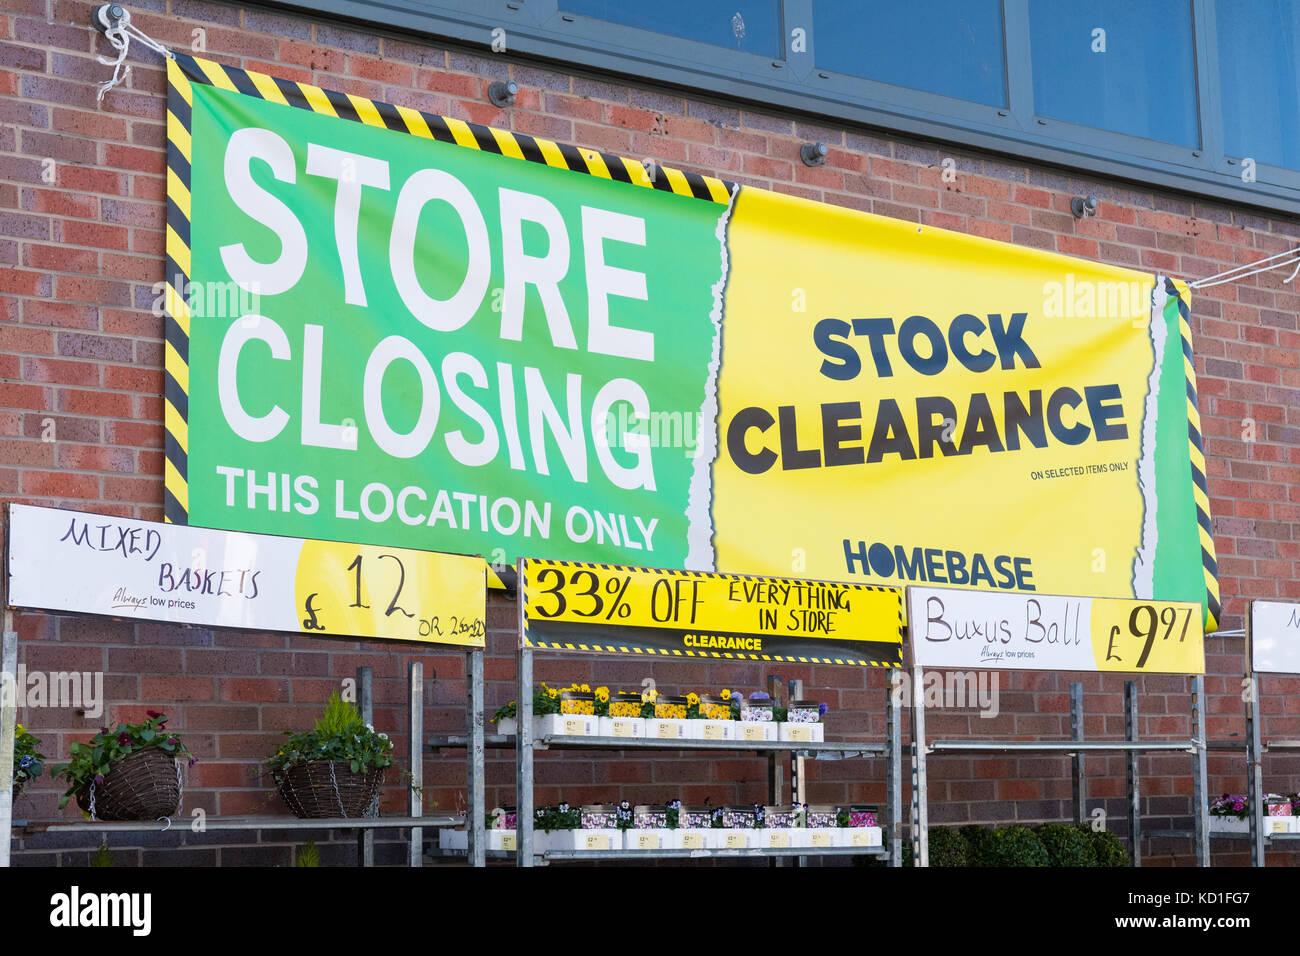 Tienda de orígen cerrando la venta firmar, Milngavie, Scotland, Reino Unido Imagen De Stock